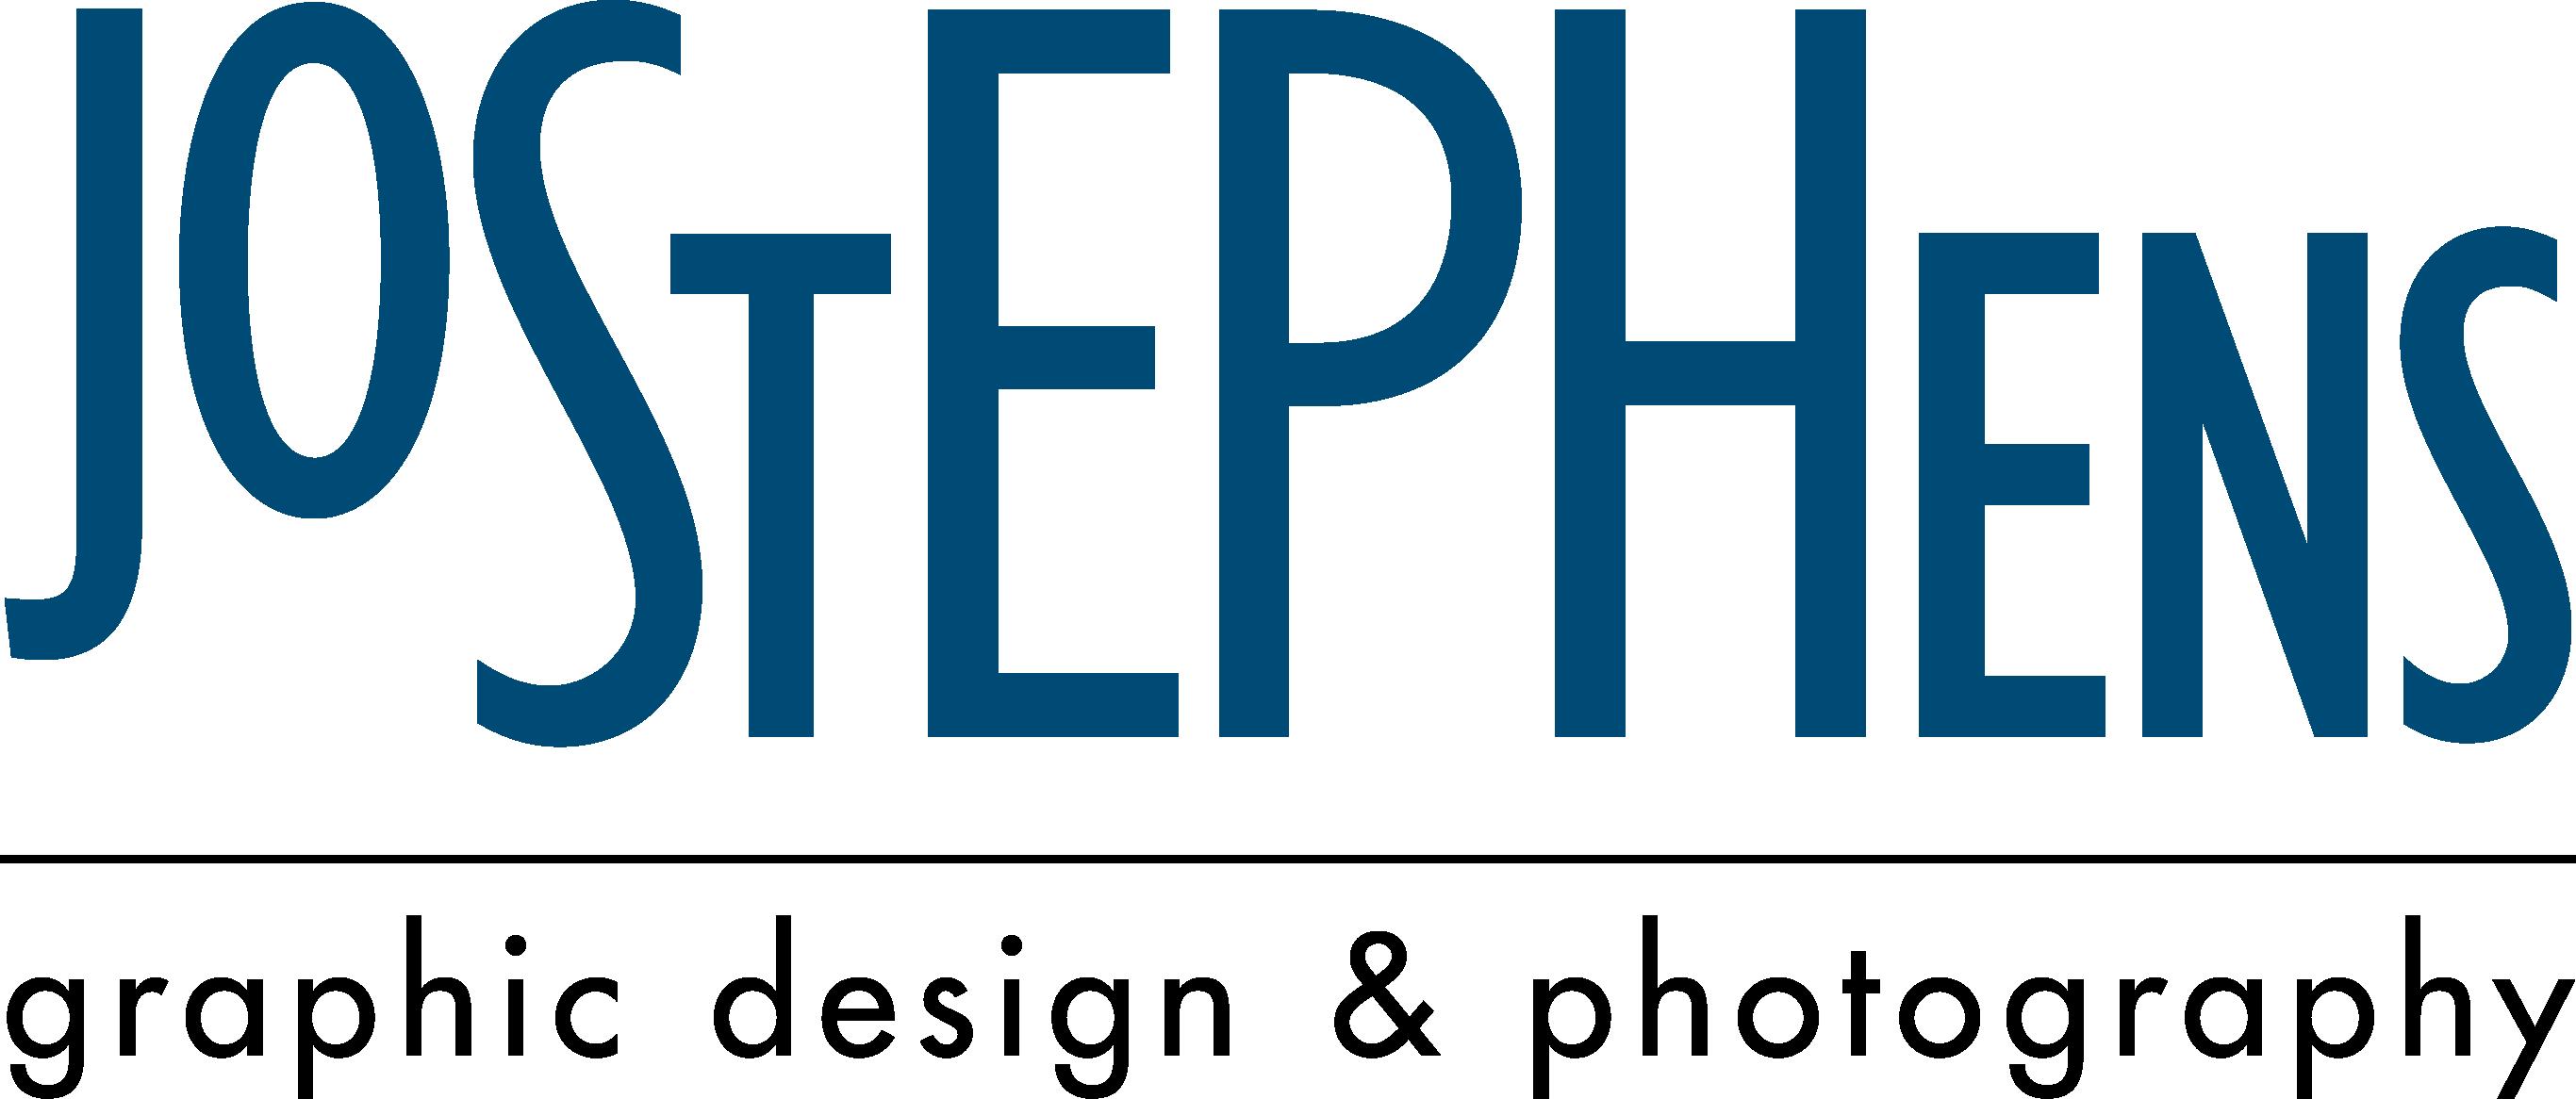 Joseph Stephens Design